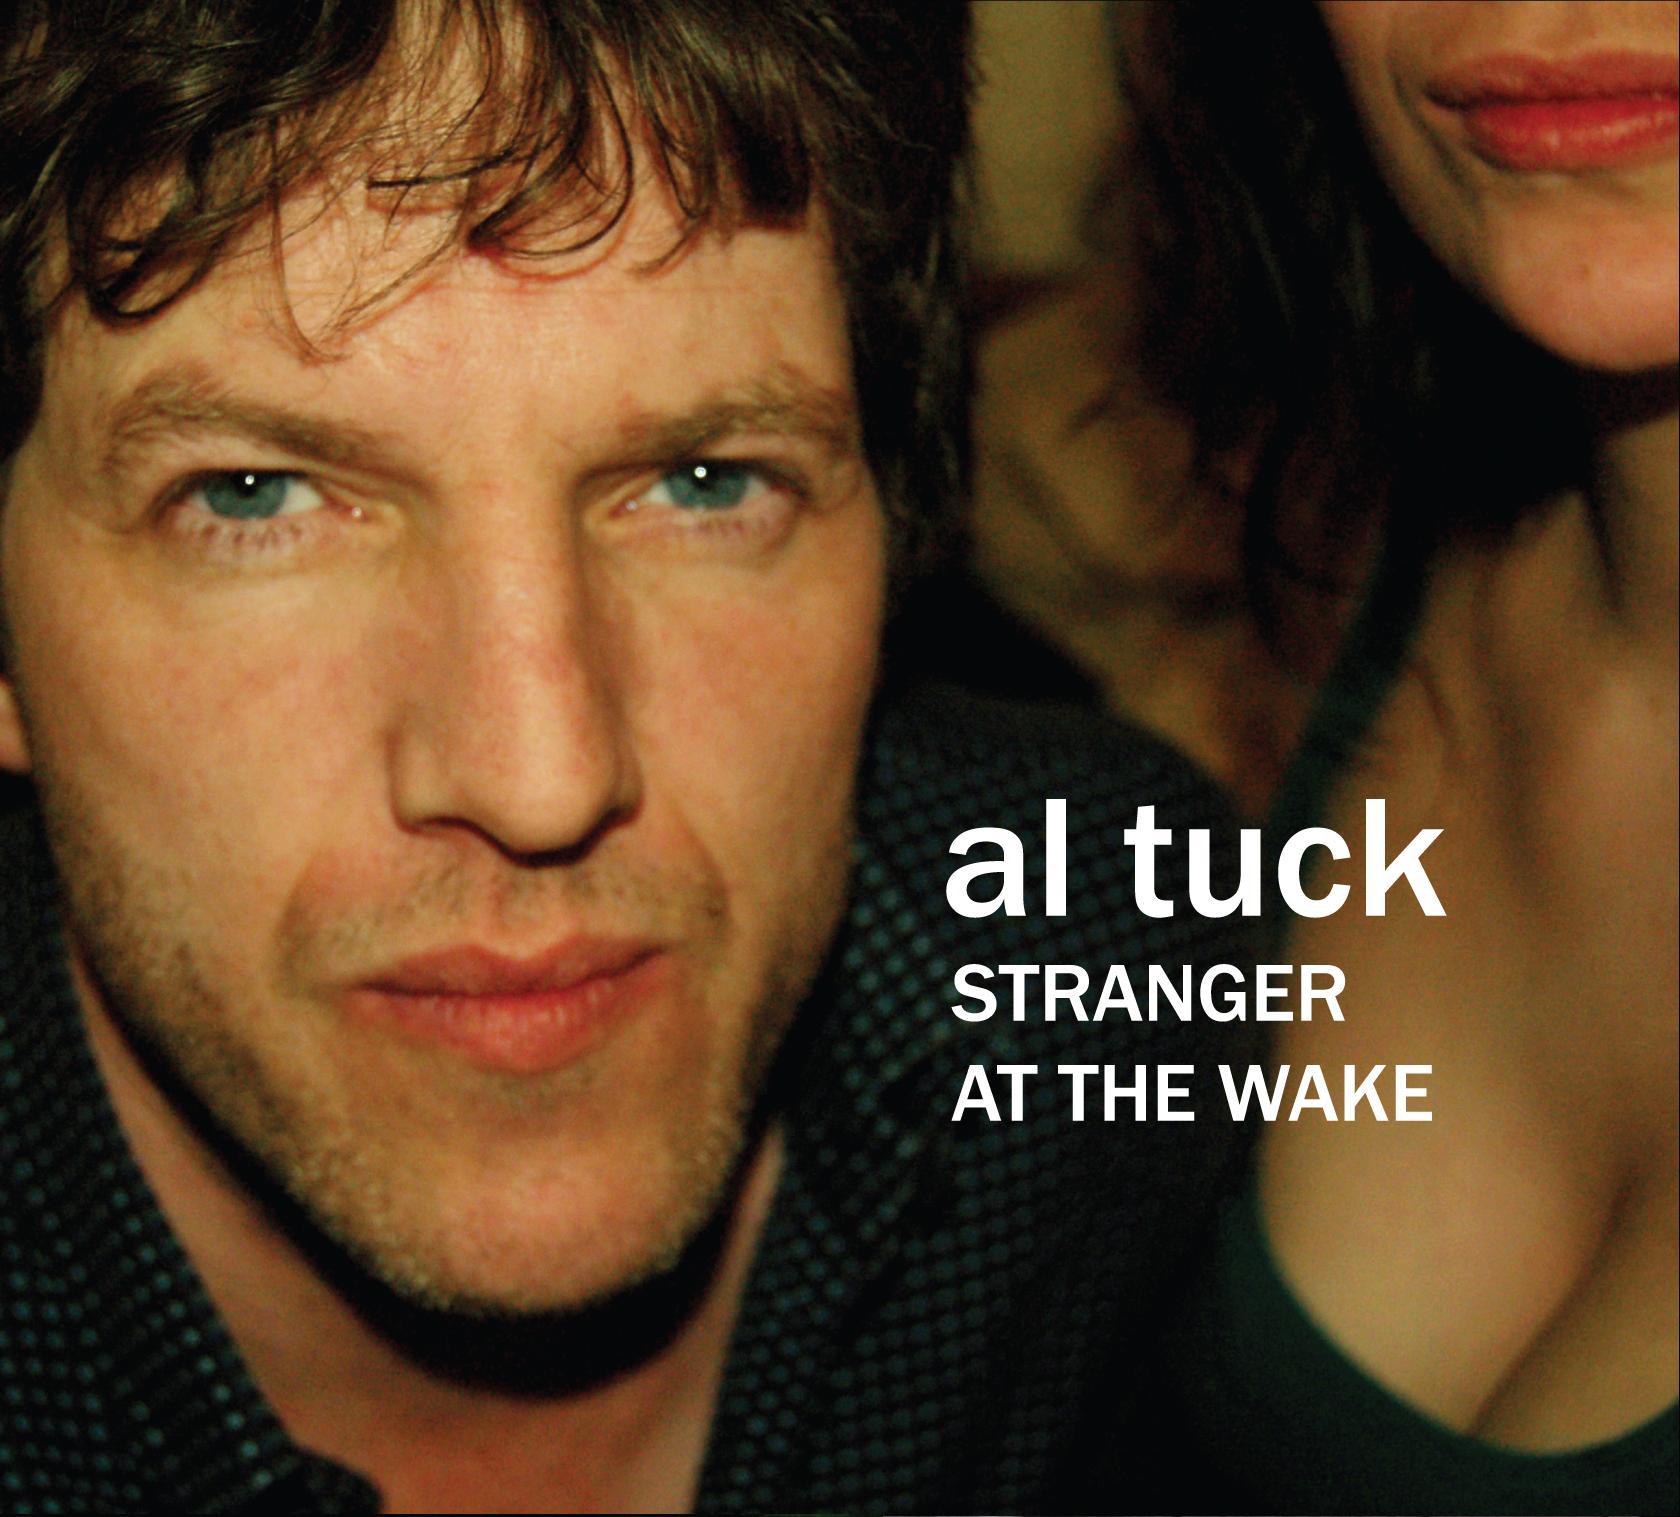 Al-tuck-strangerathewake.jpg